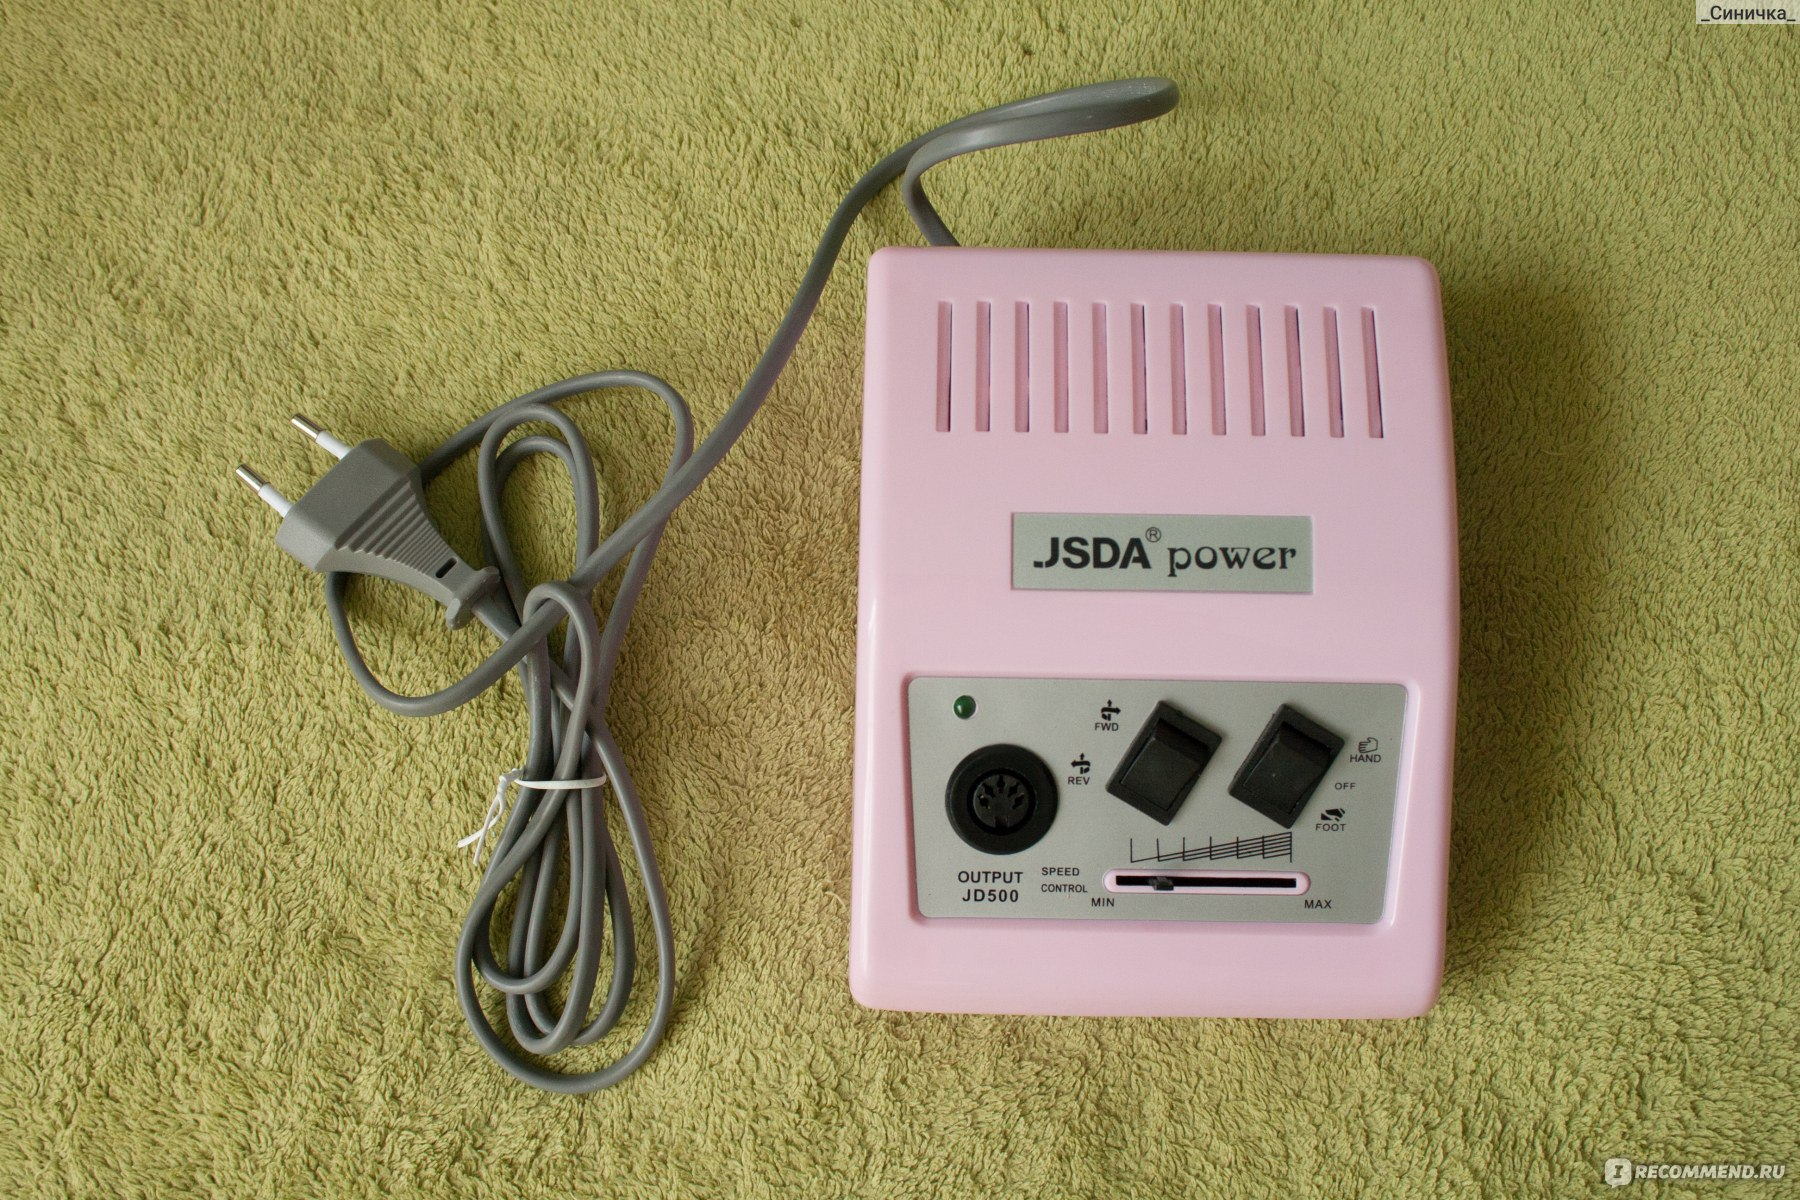 Аппарат для маникюра jd 5500 jsda отзывы